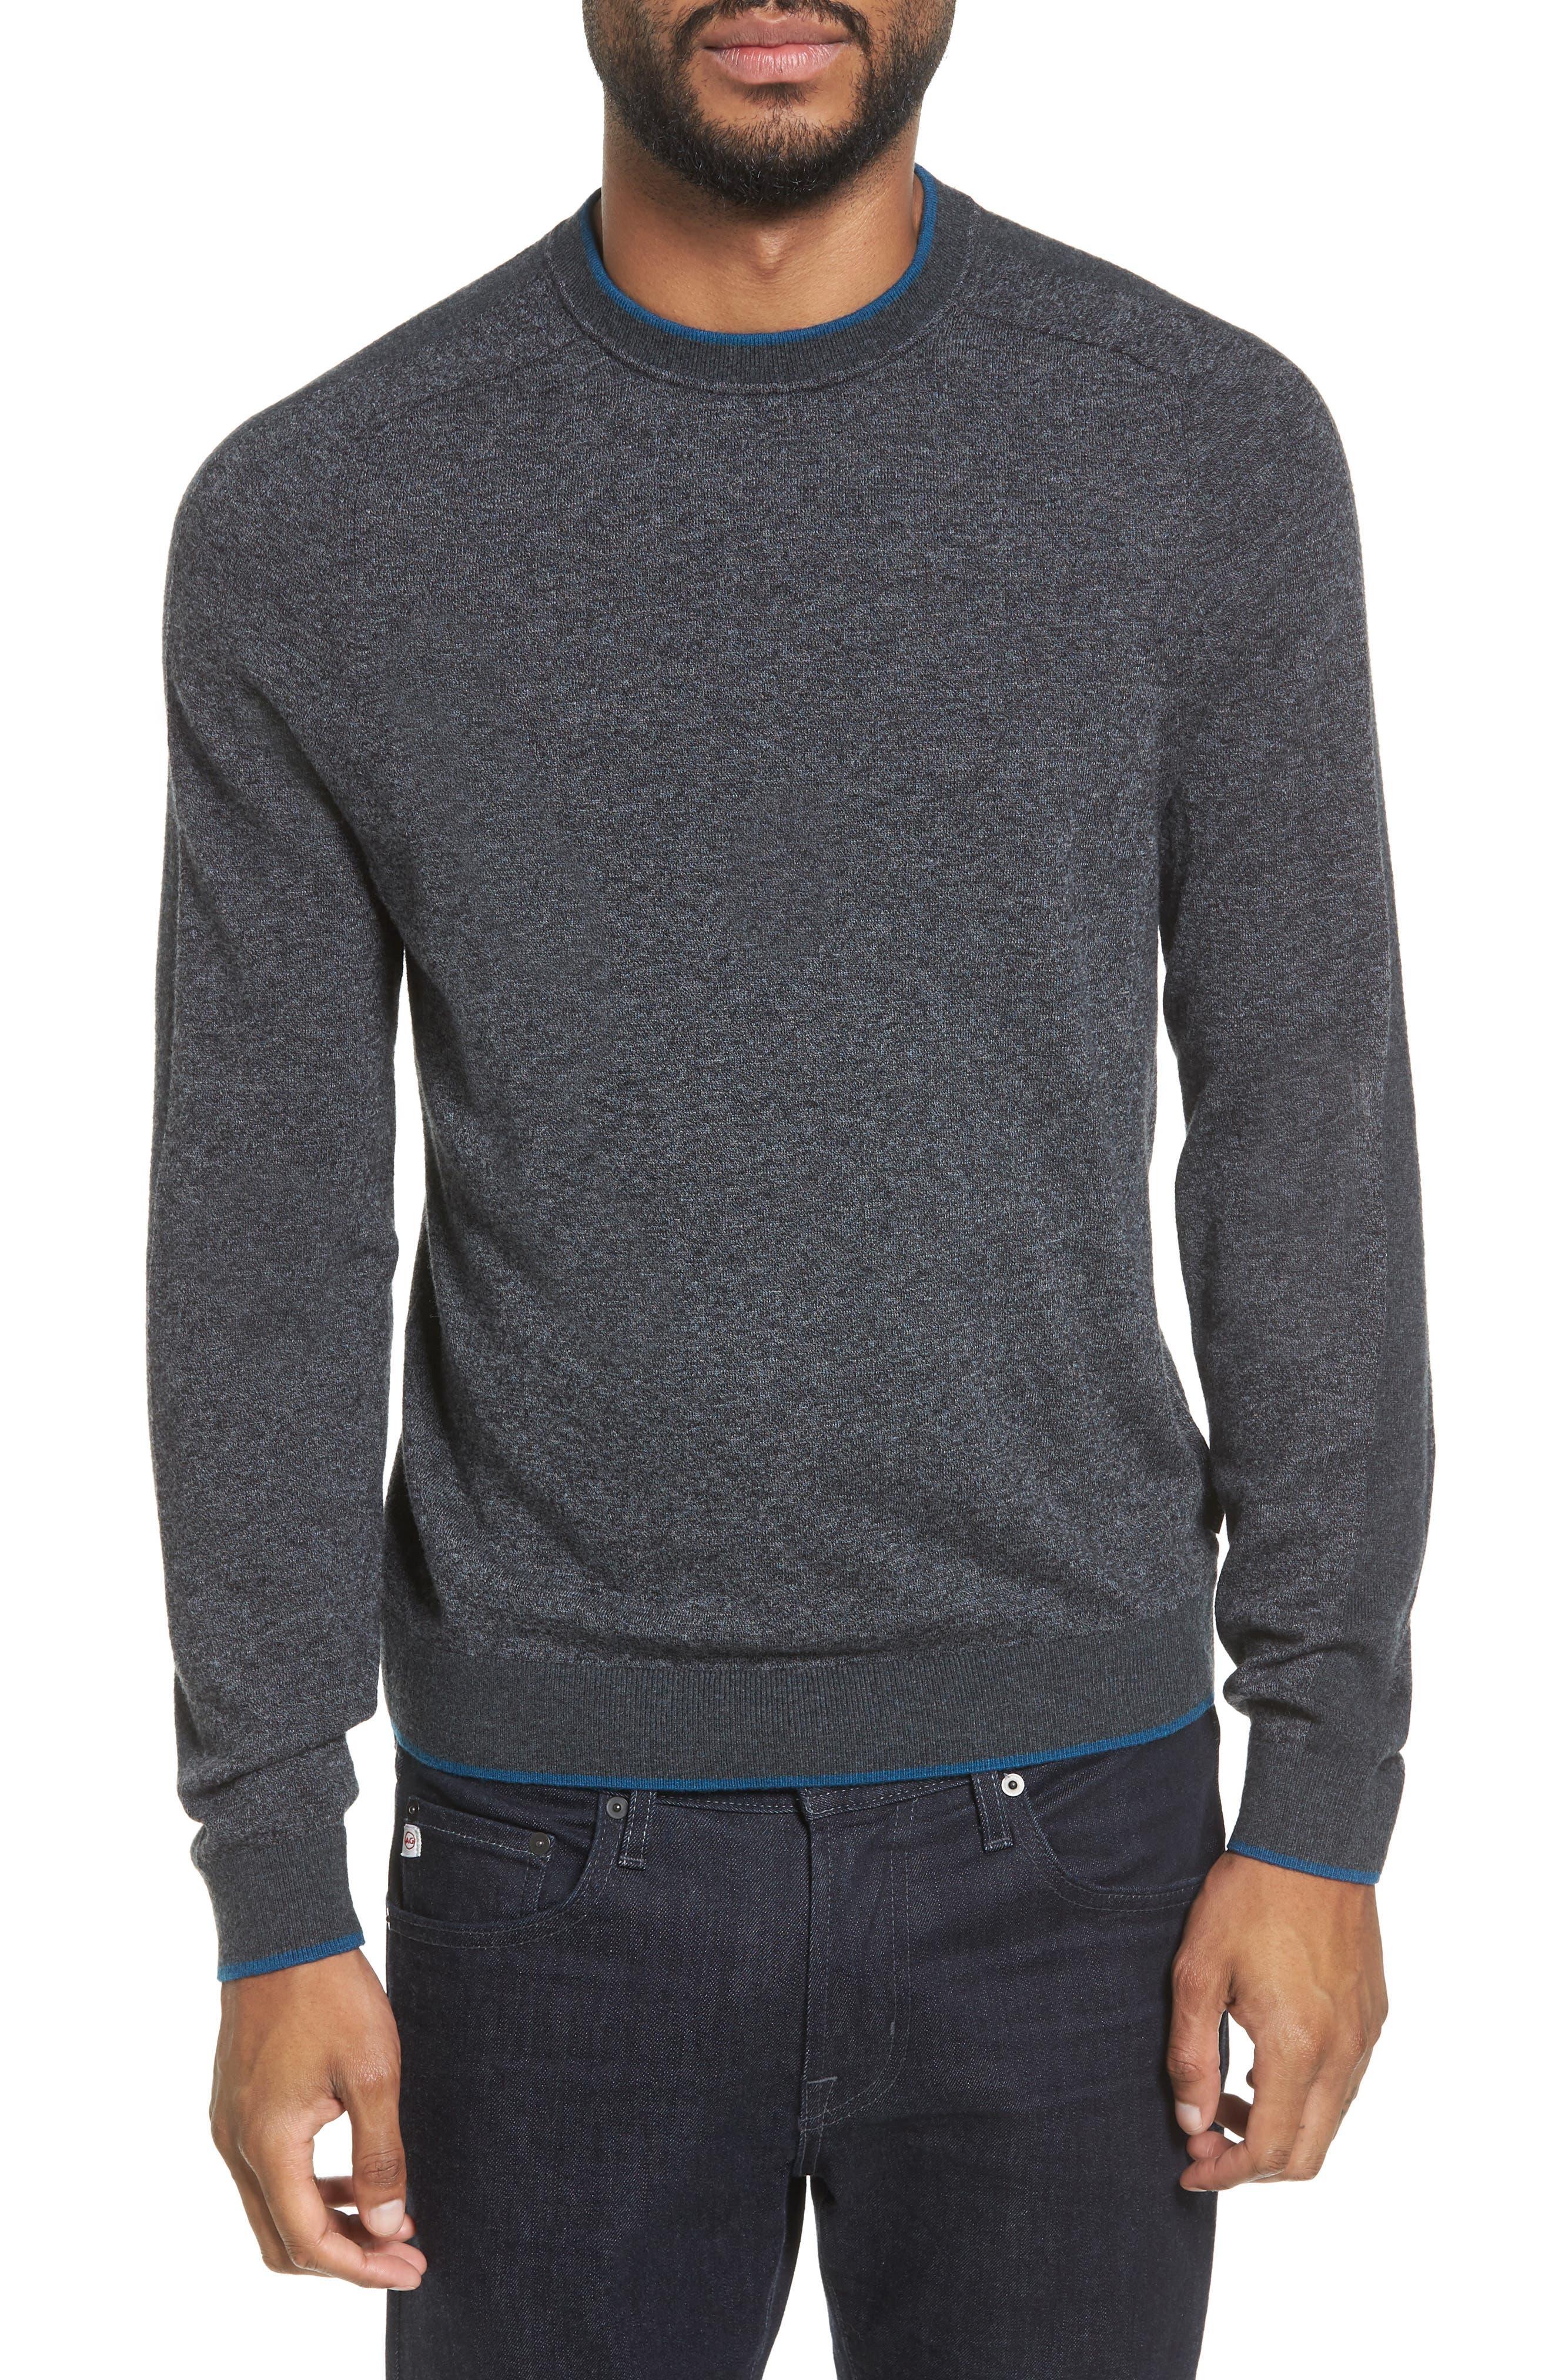 Norpol Crewneck Sweater,                             Main thumbnail 1, color,